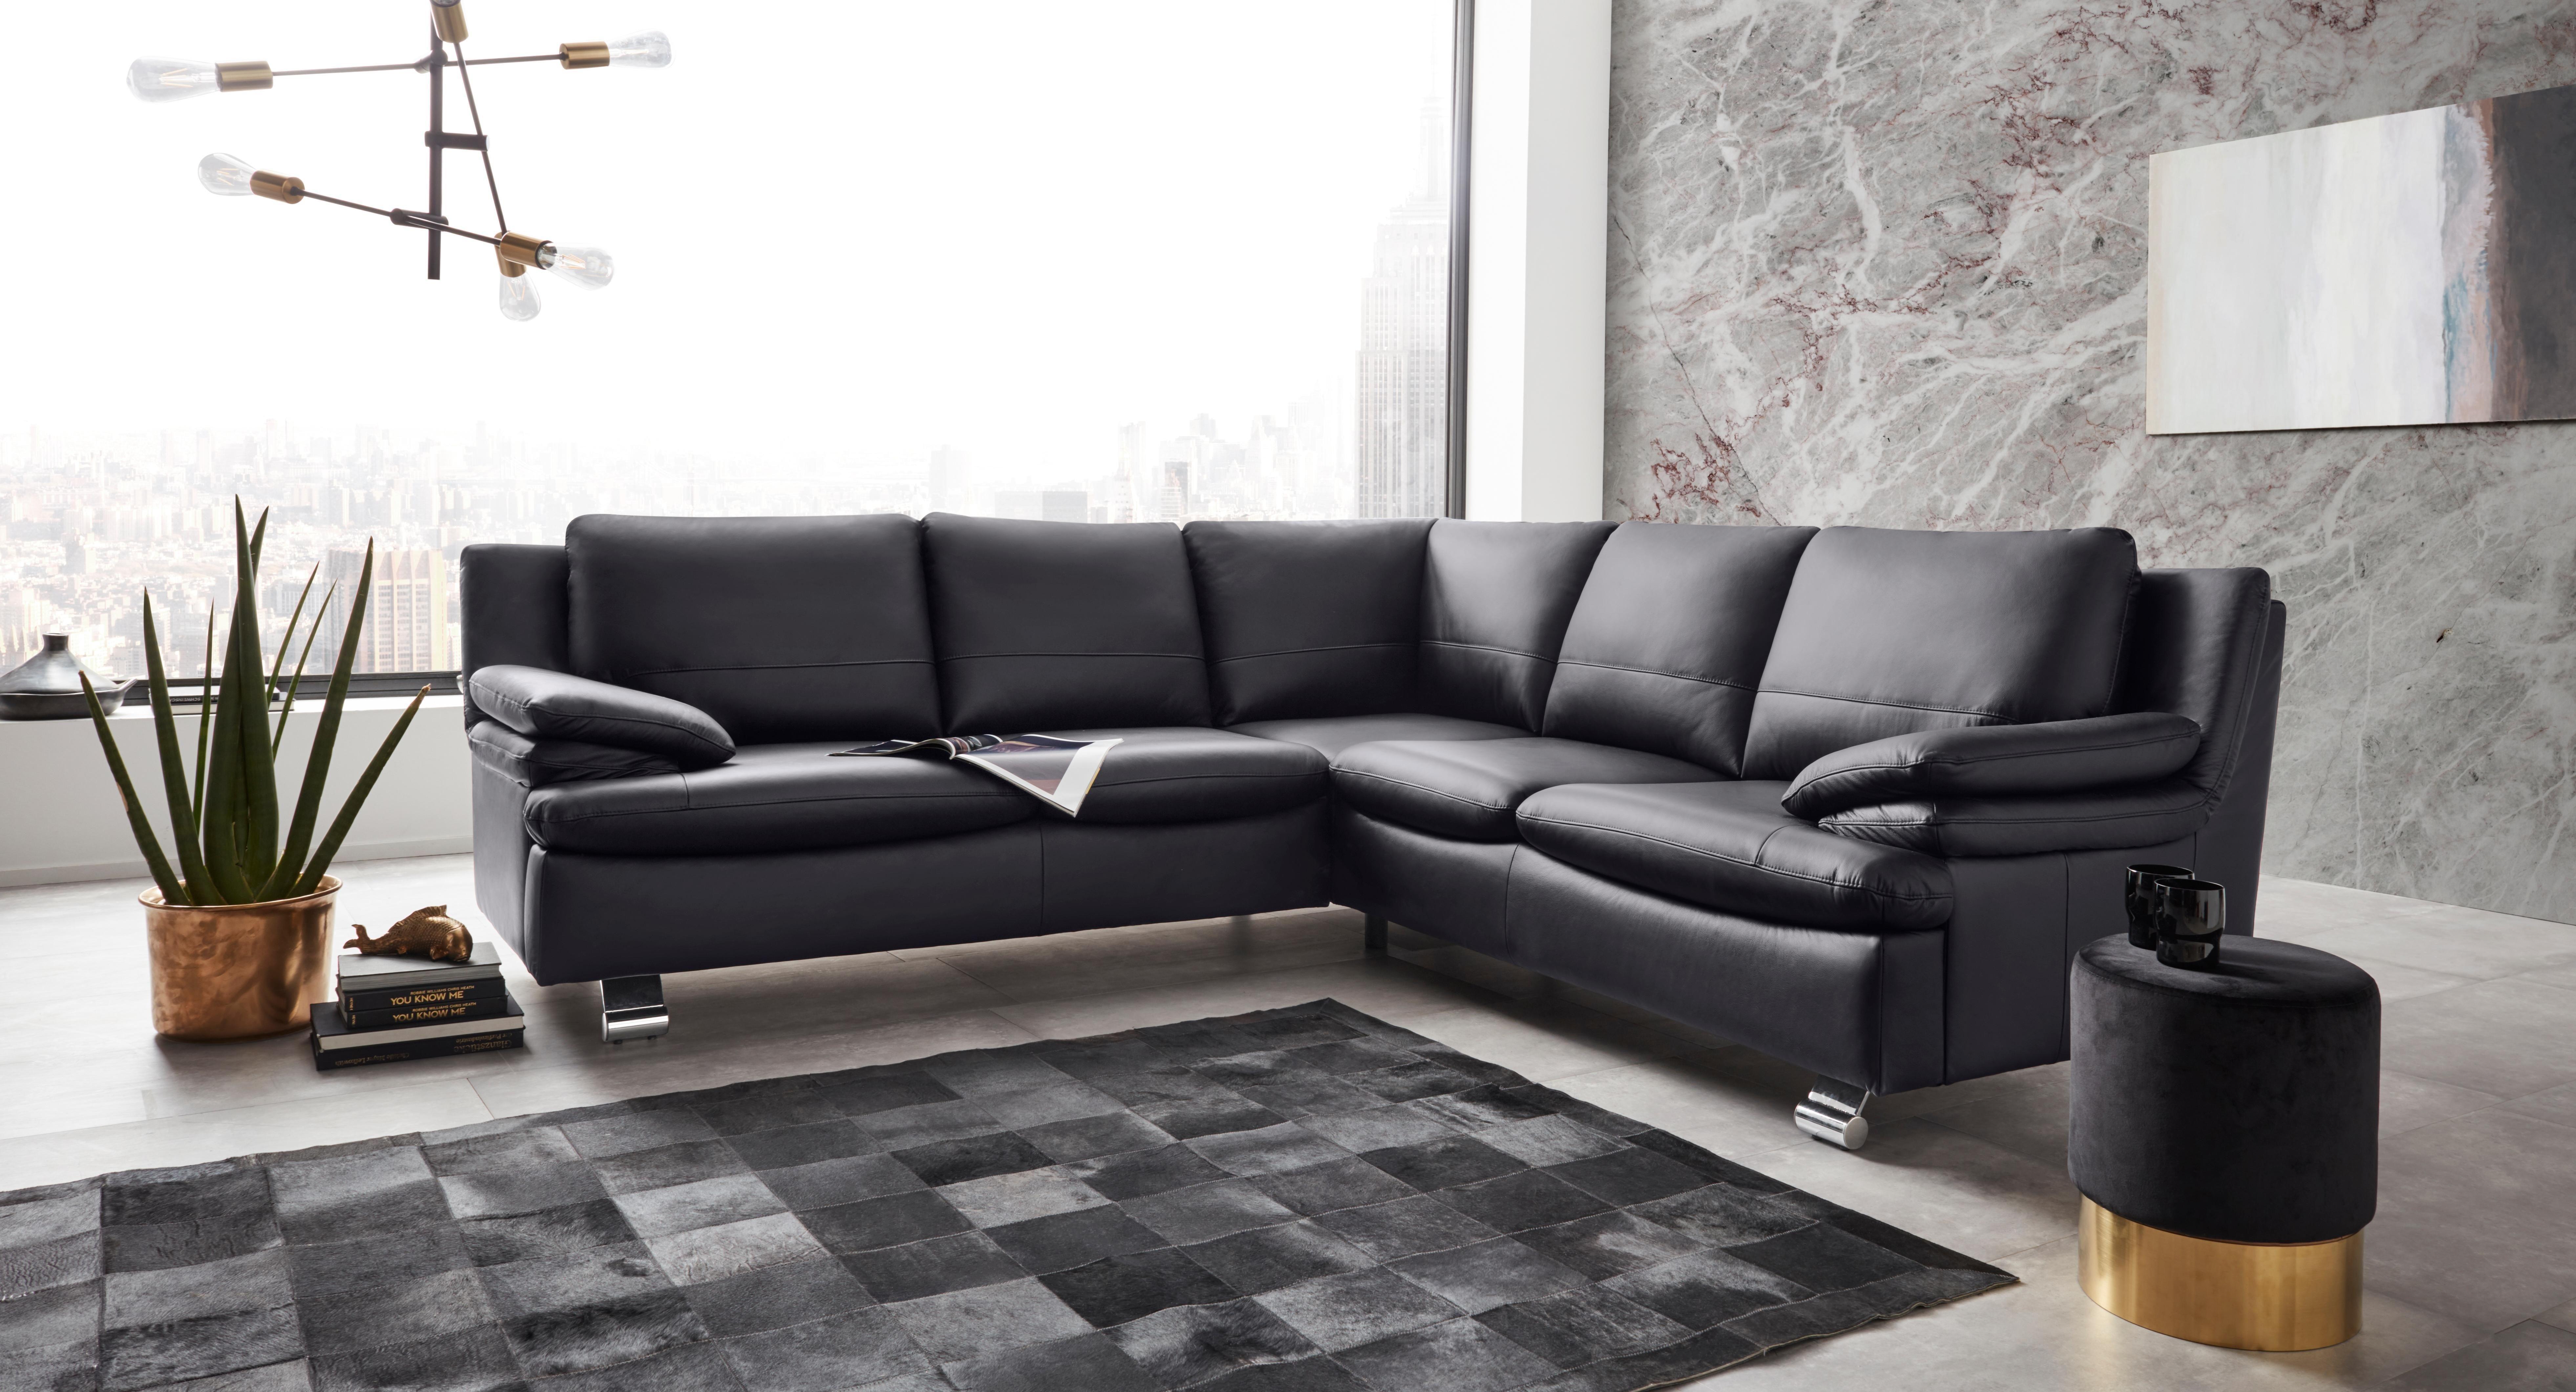 Moderne Sofas Leder Ecksofa Leder Weiss Gunstig 2 Sitzer Sofa Mit Relaxfunktion Ecksofa Kaufen Gunstig Sofa 2 5 Sitzer Leder Wohnen Ecksofa Dekor